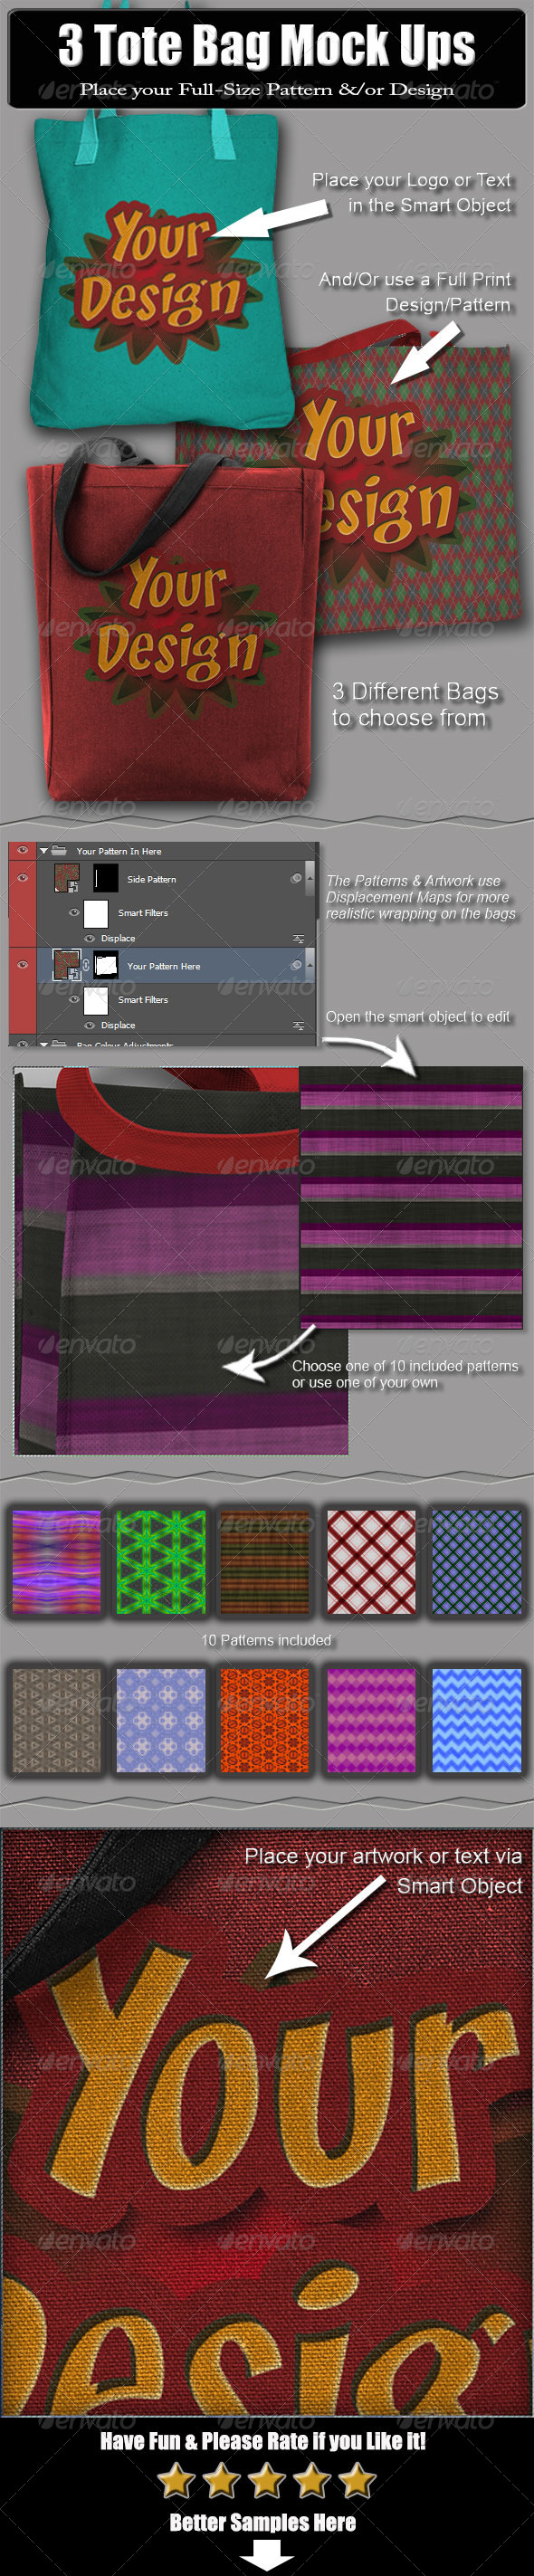 3 Tote Bag Mock Ups - Miscellaneous Apparel